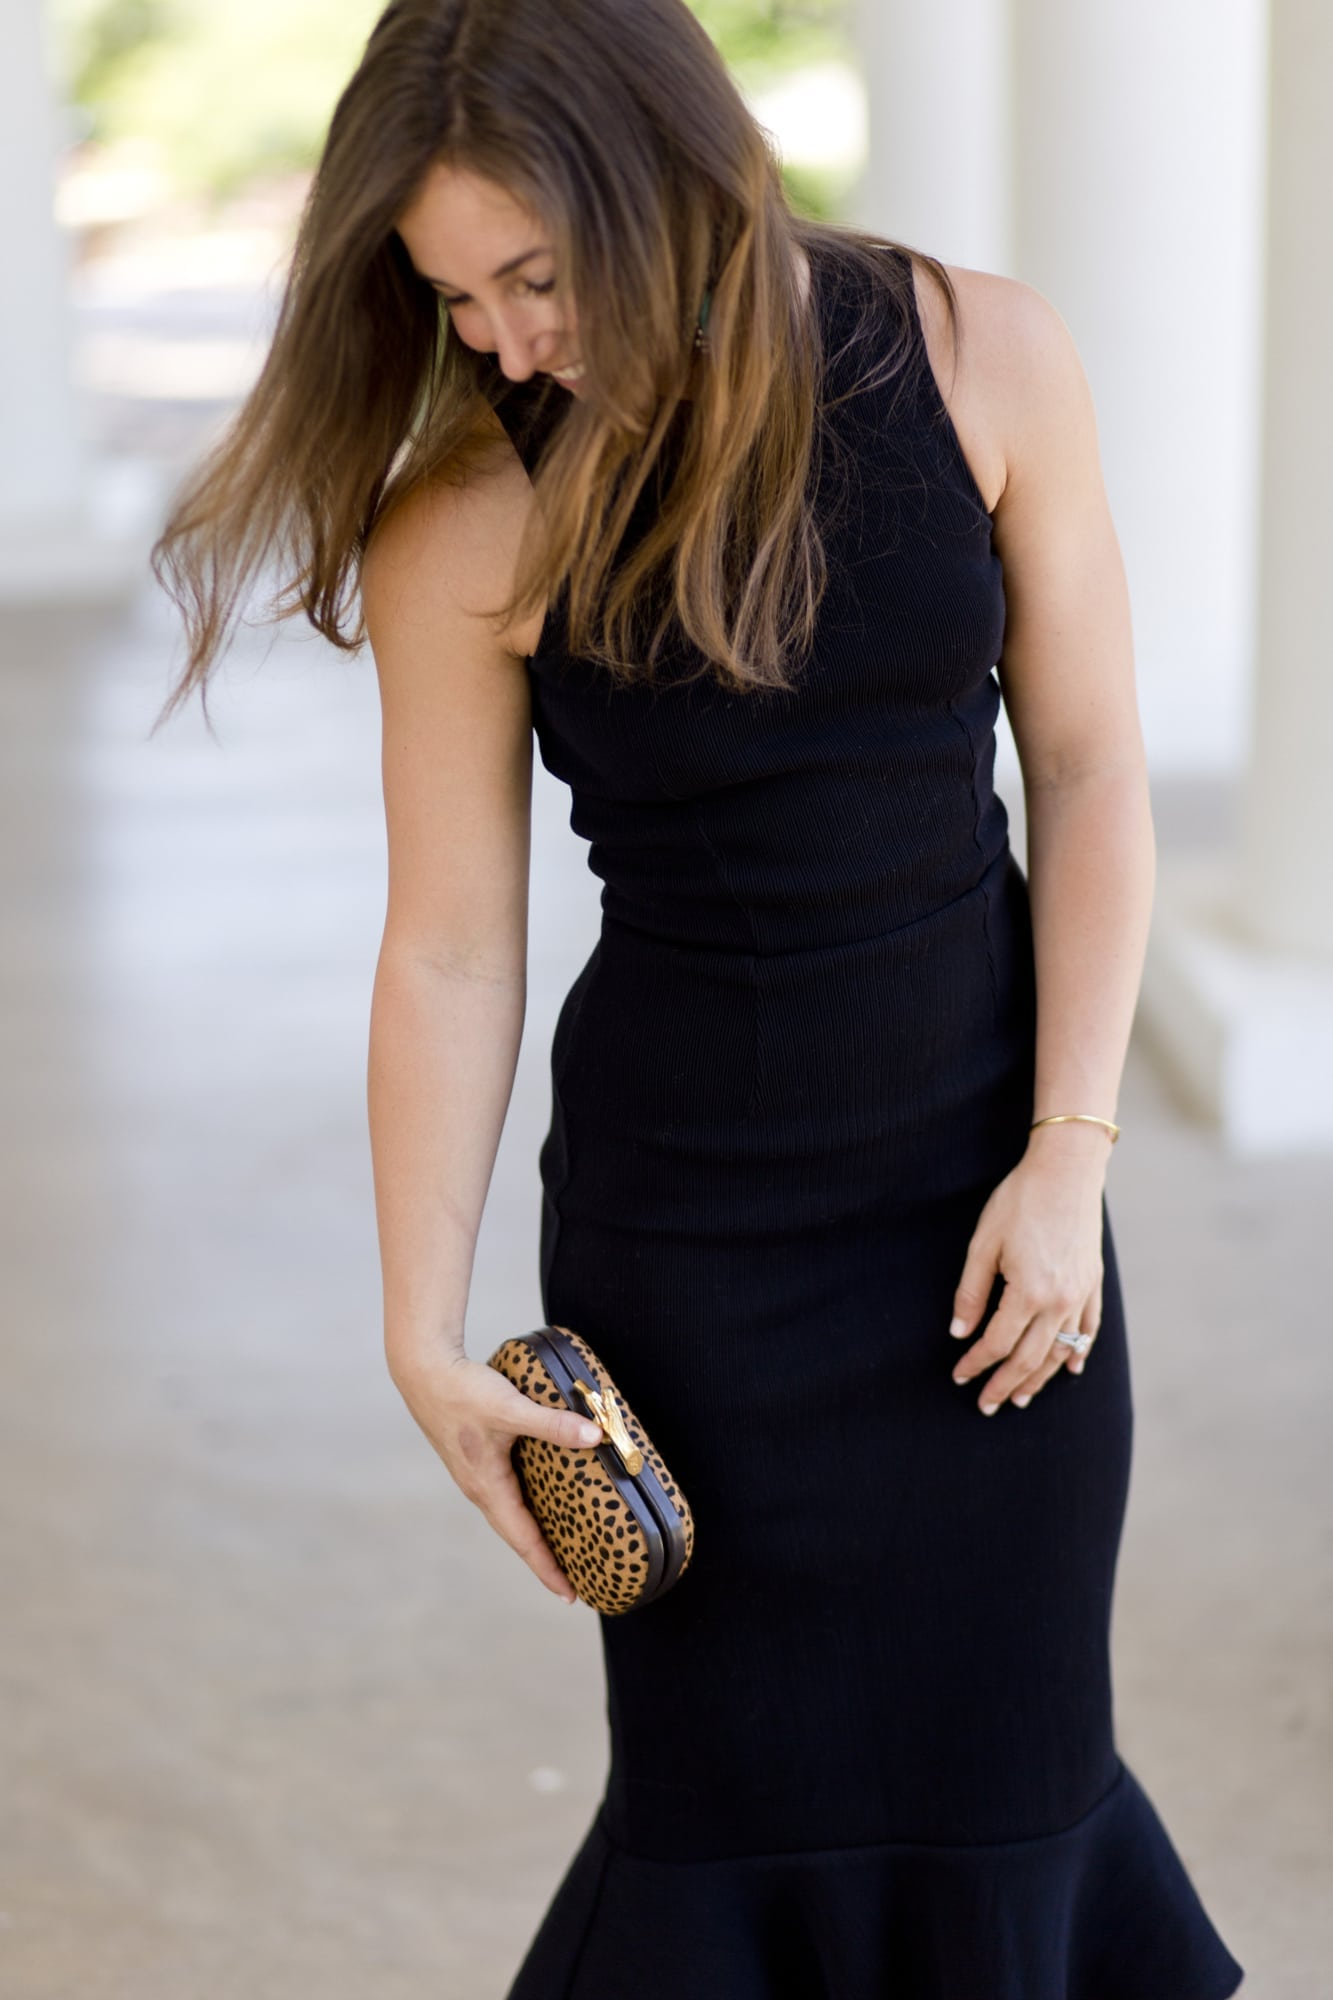 Cheetah Clutch and Black Bodycon Dress